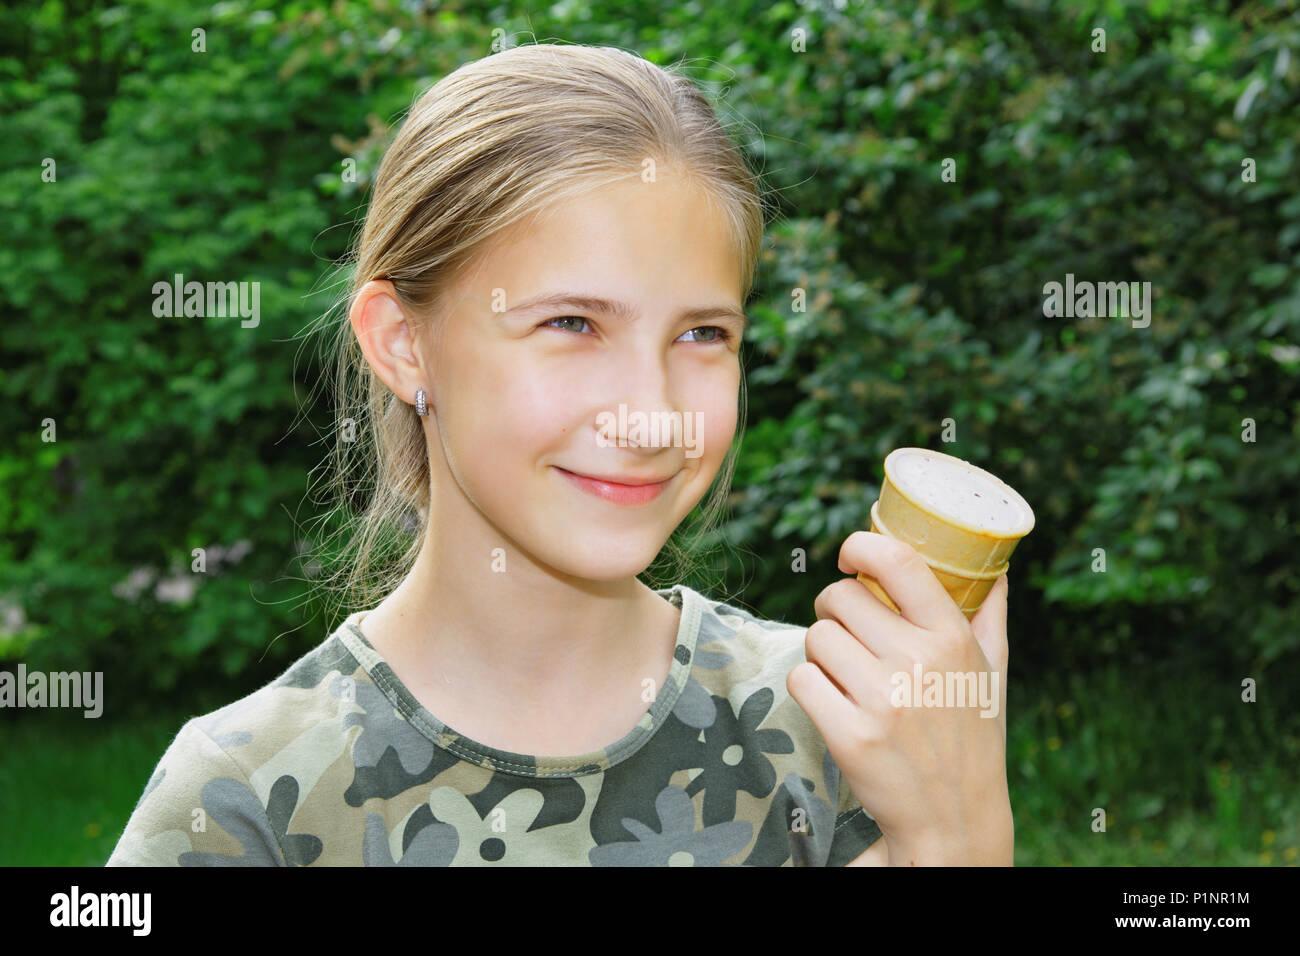 russian teen girl stock photos russian teen girl stock. Black Bedroom Furniture Sets. Home Design Ideas